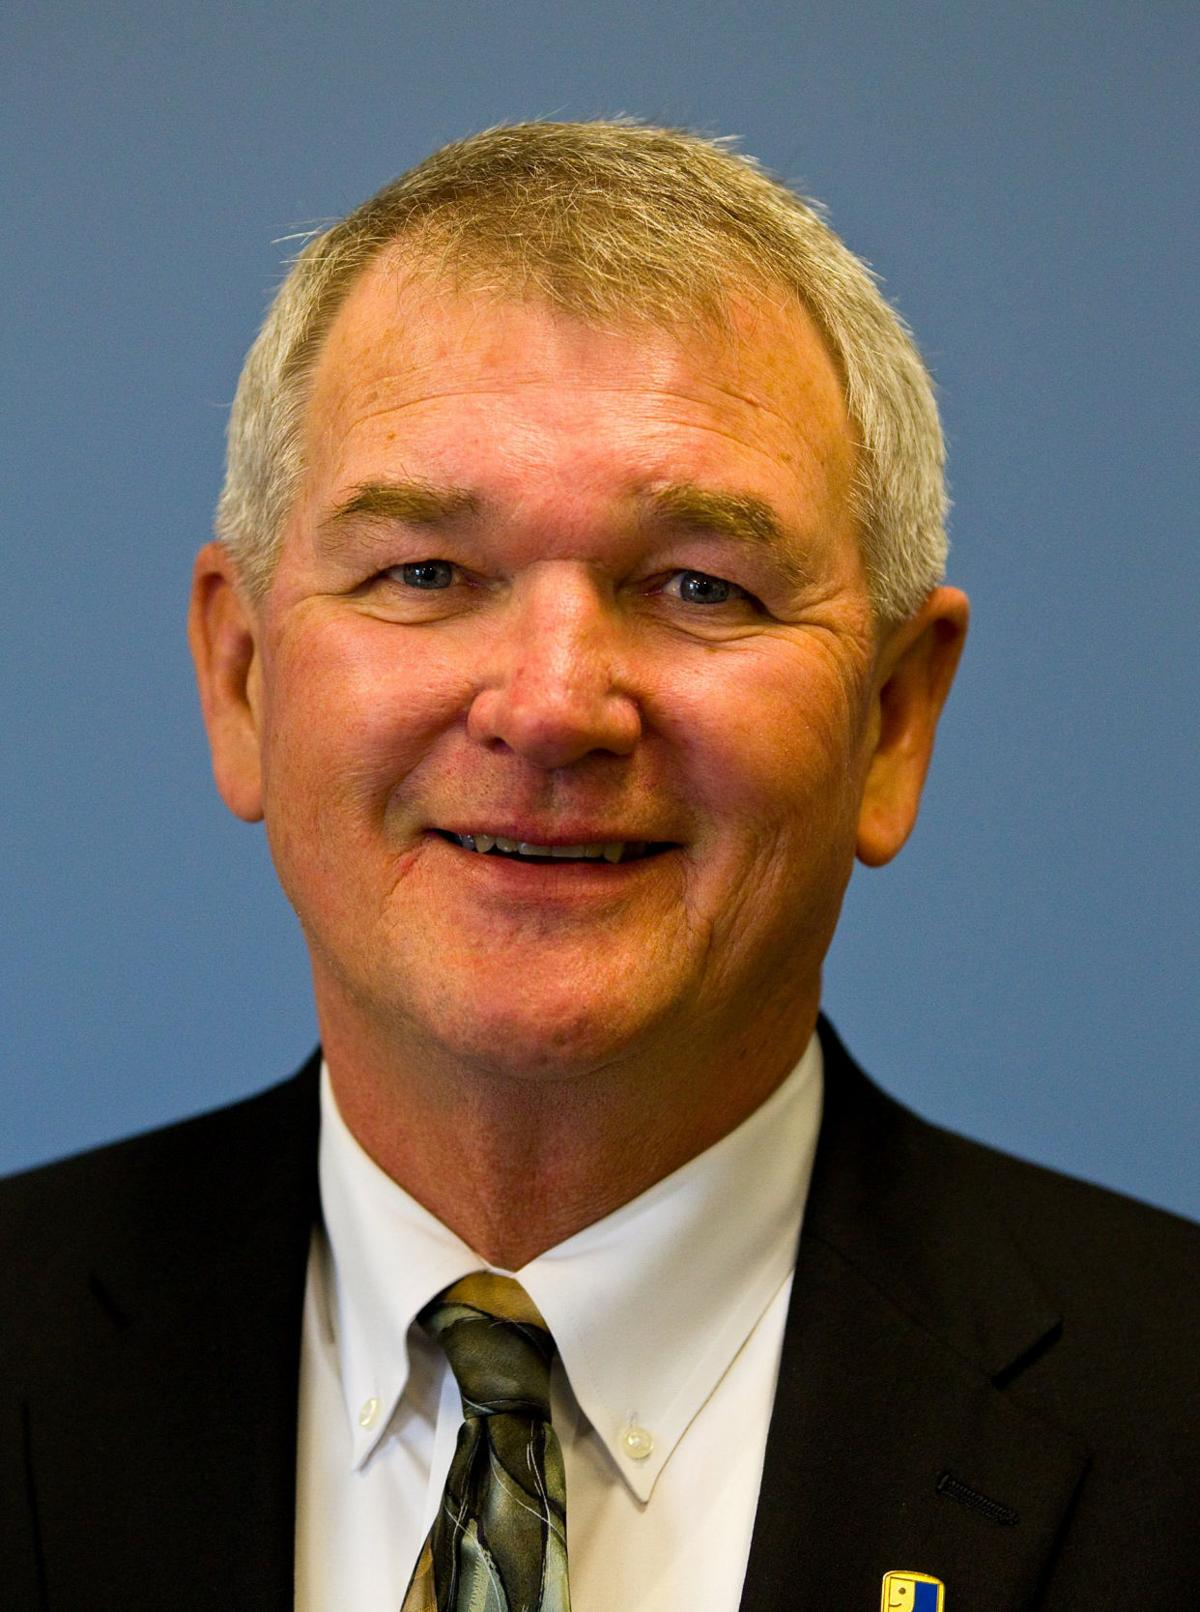 Frank McGree